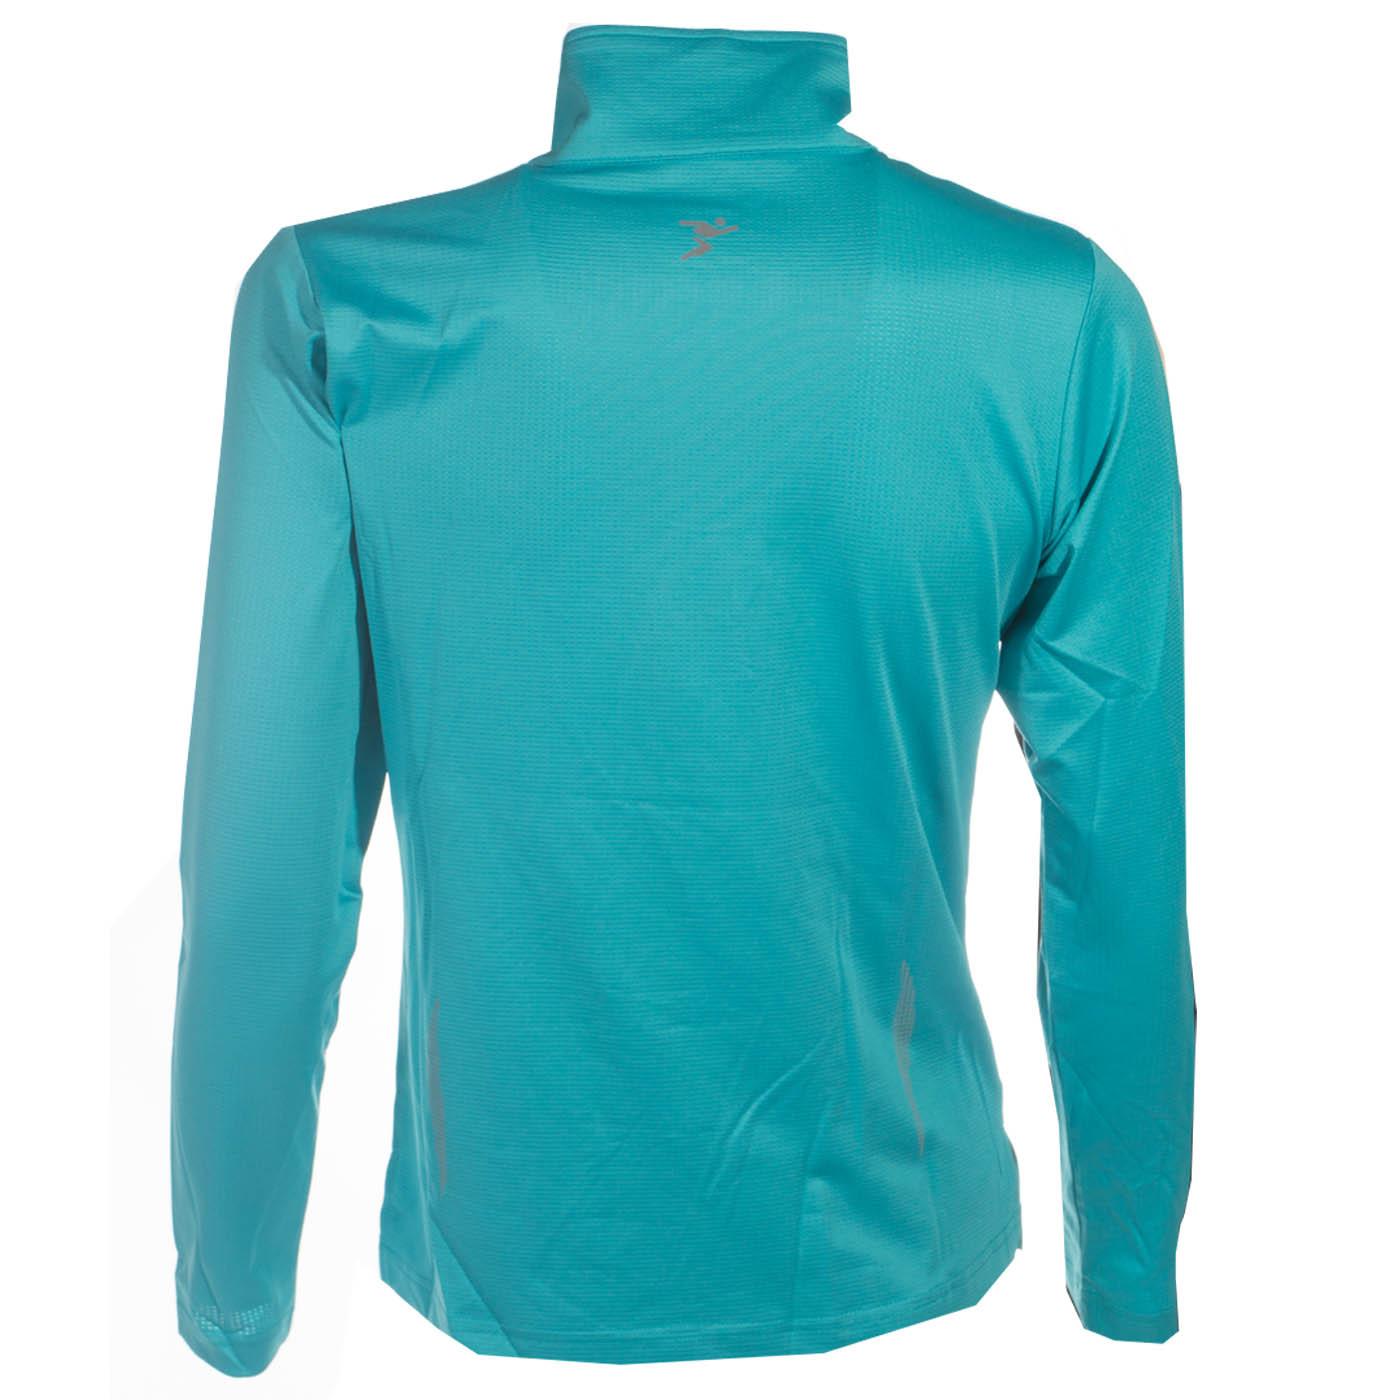 Precision Running Womens Ladies 1//4 Zip Fitness Shirt Top Turquoise